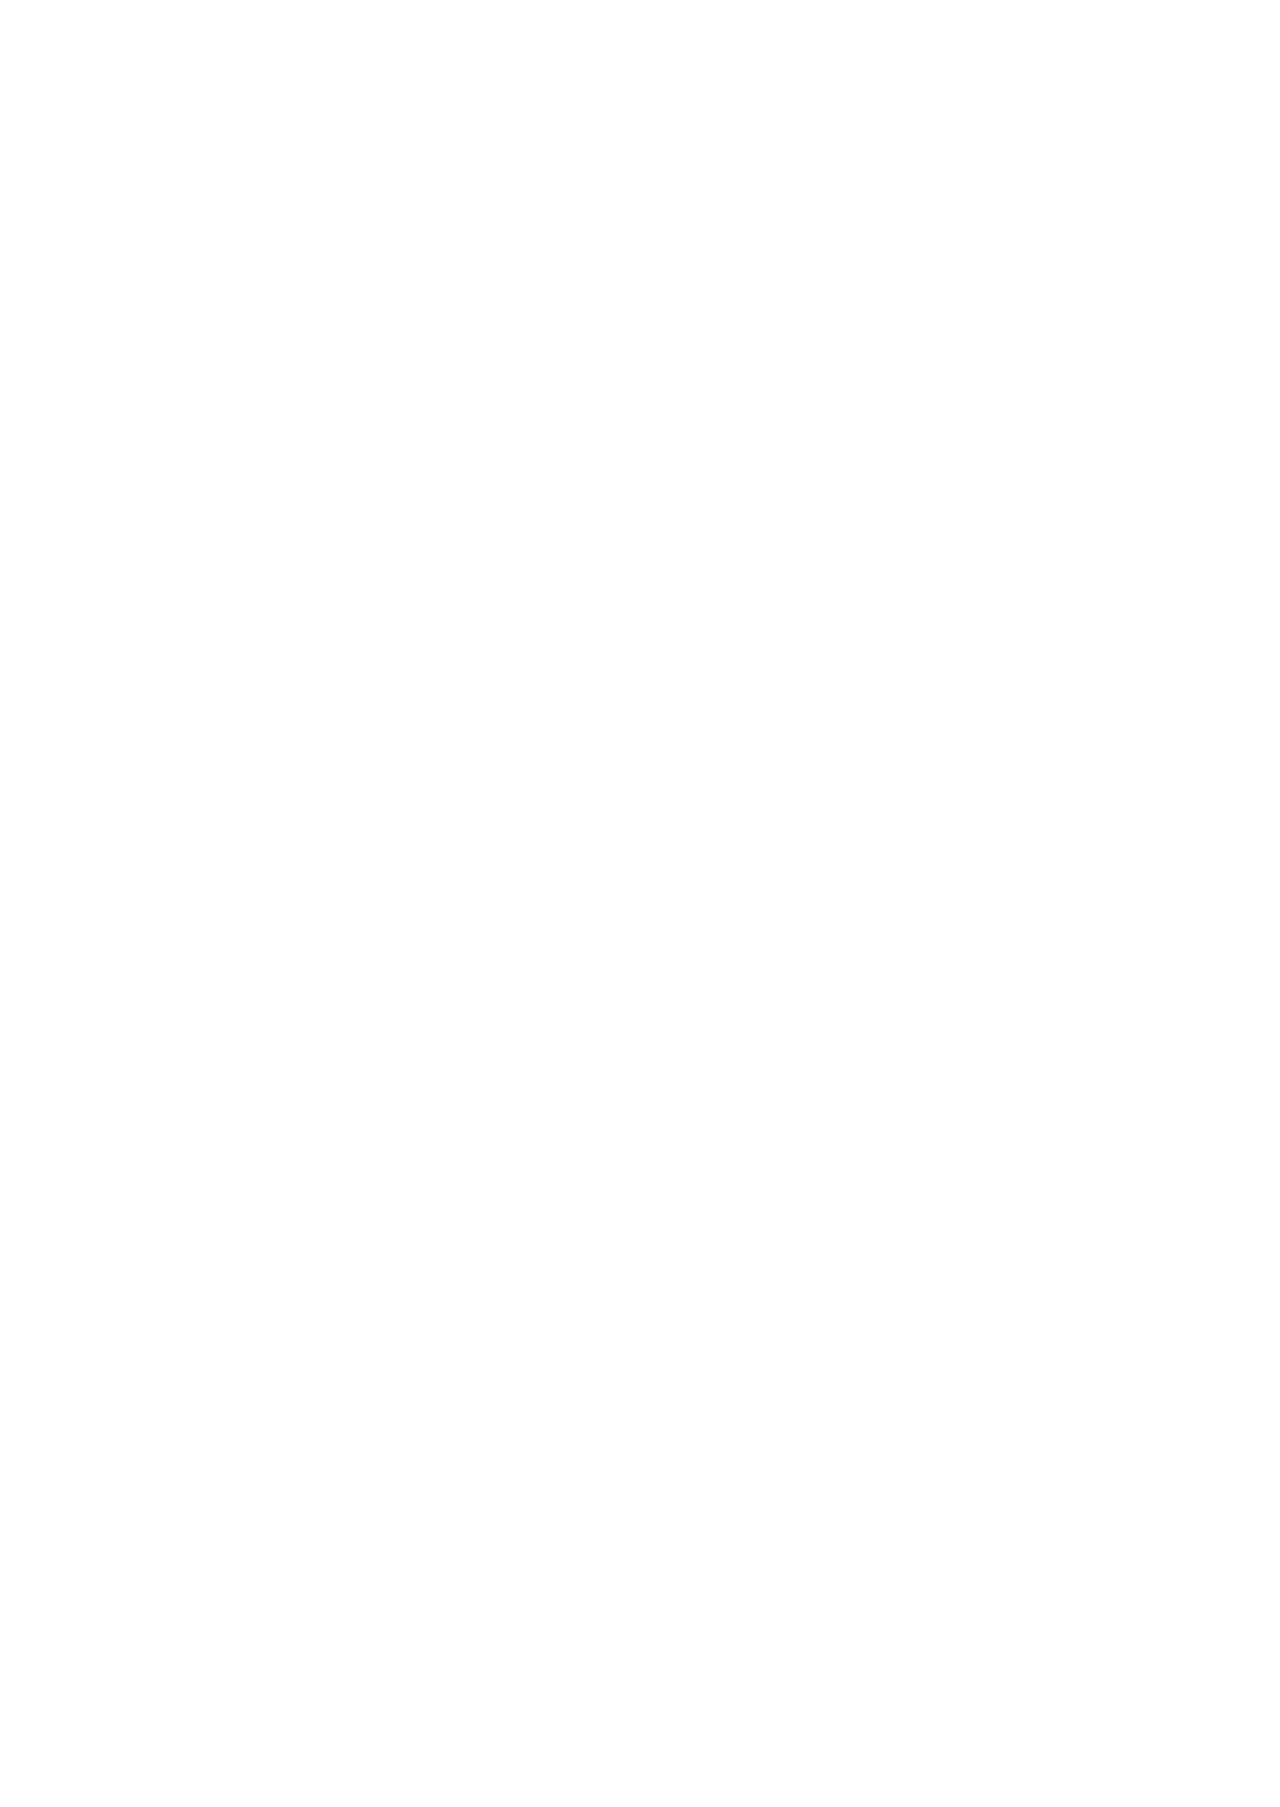 [Kitsuneya (Leafy)] Kama-chan to Love-prescription (Fate/Grand Order) [Digital] 1